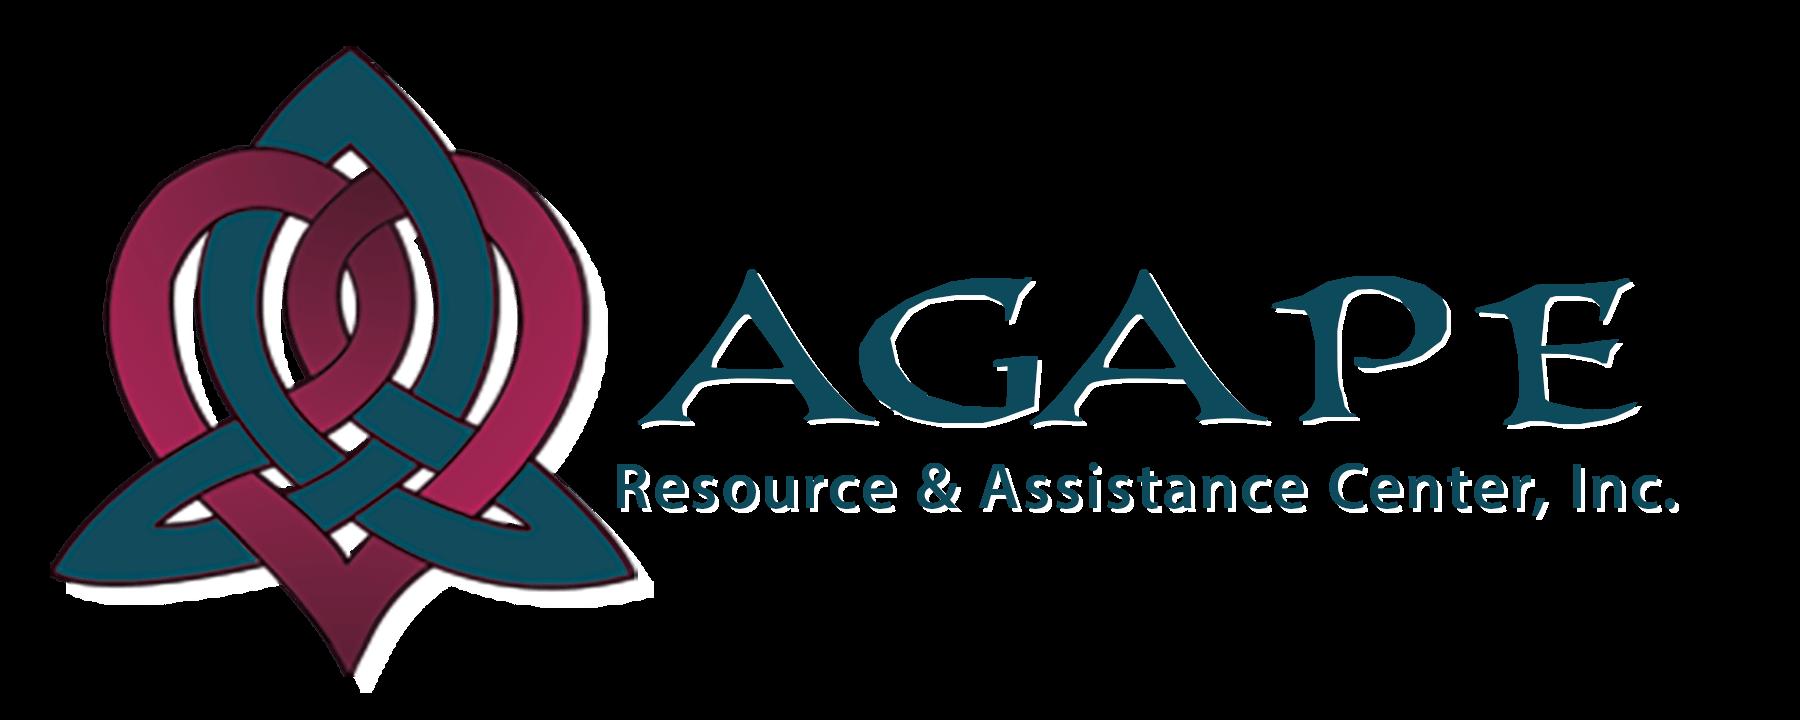 AGAPE - Resource & Assistance Center